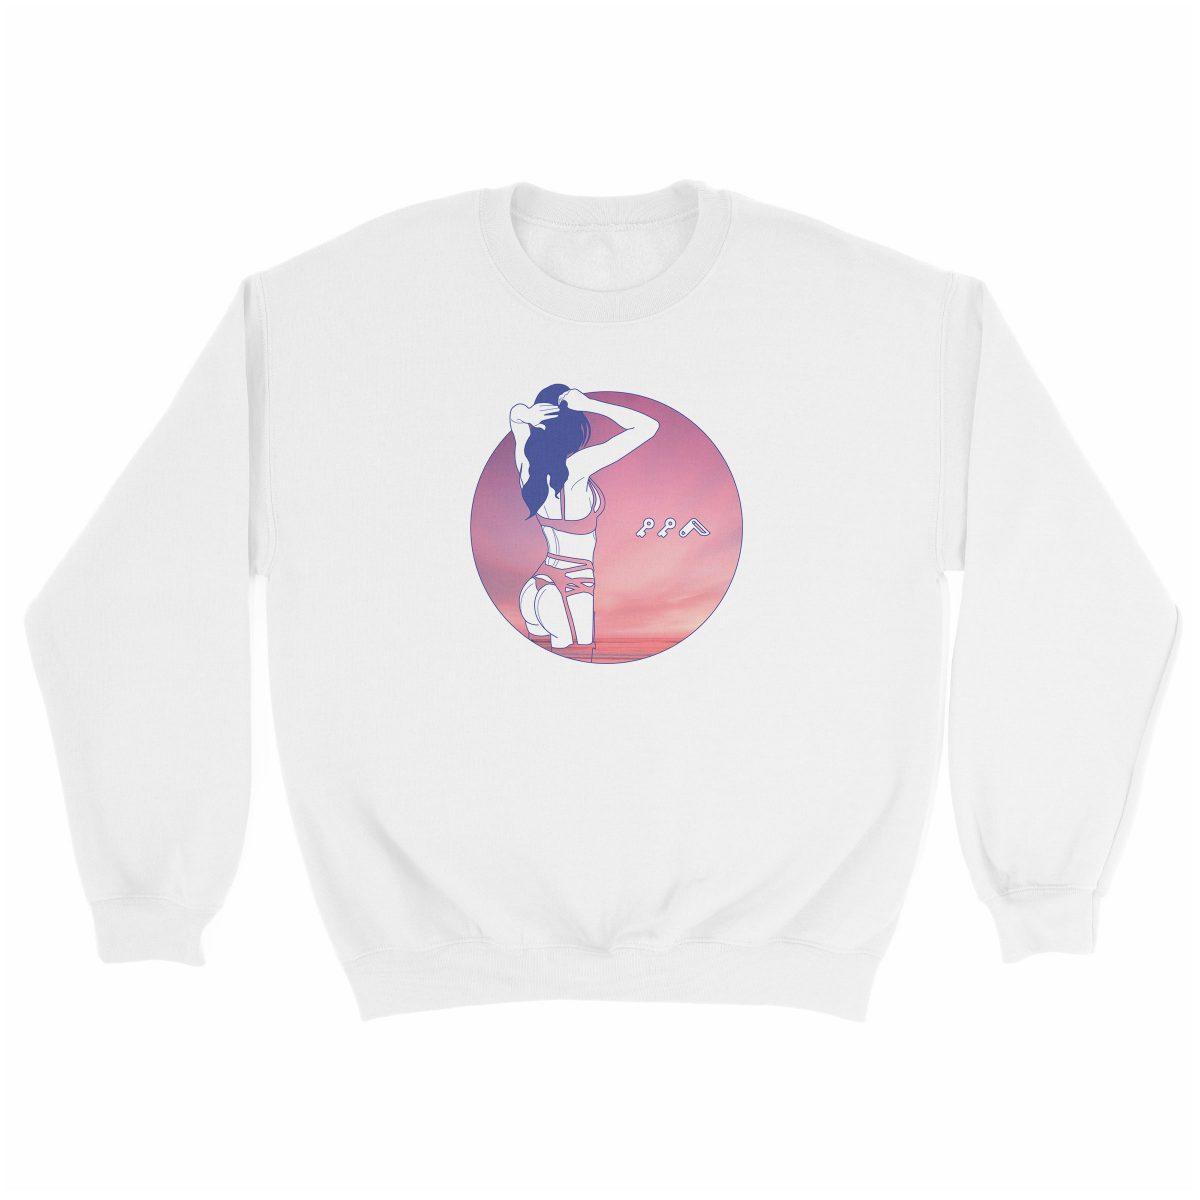 """NIGHT MOVES"" music festival beach sweatshirt in white"